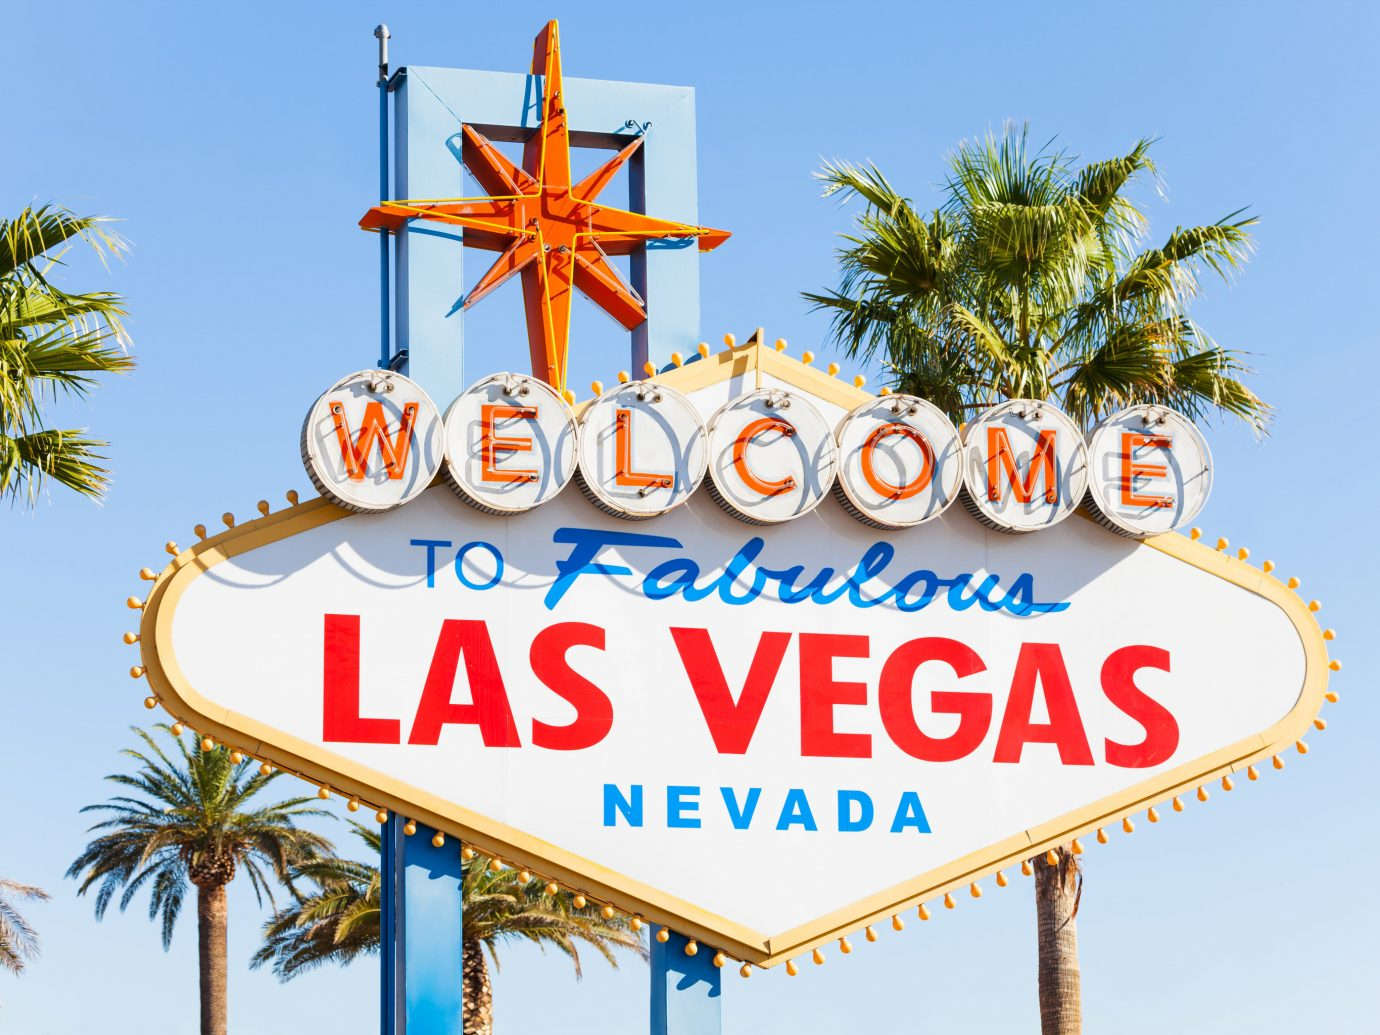 News Trip Ideas sky tree text outdoor sign leisure vacation advertising amusement park Resort